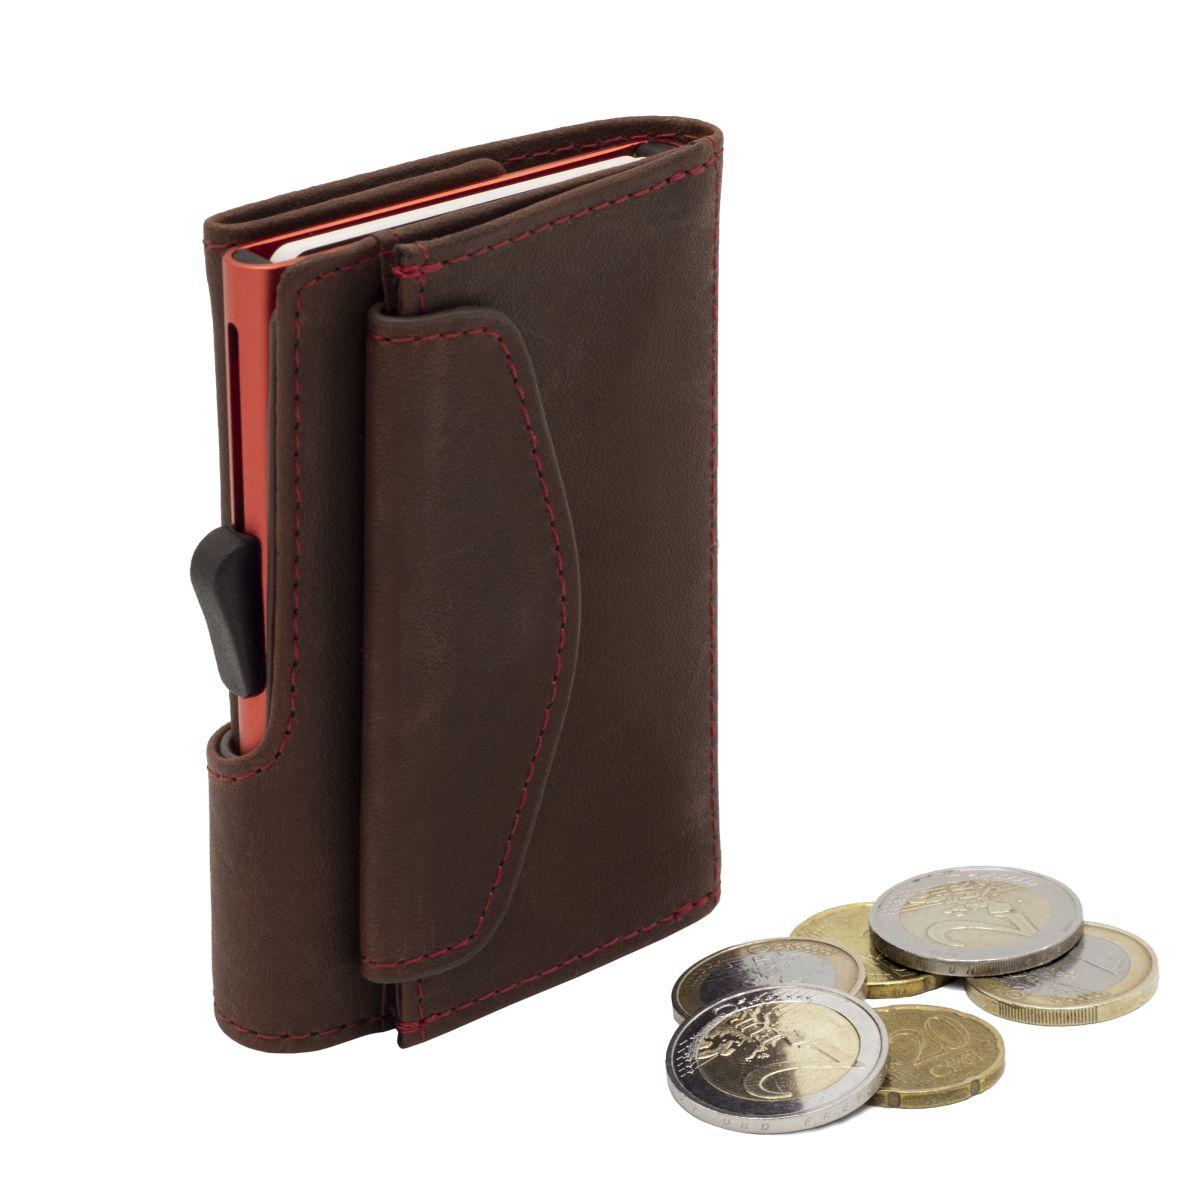 C-Secure ארנק אלומיניום בשילוב עור עם תא למטבעות - חום \ אדום